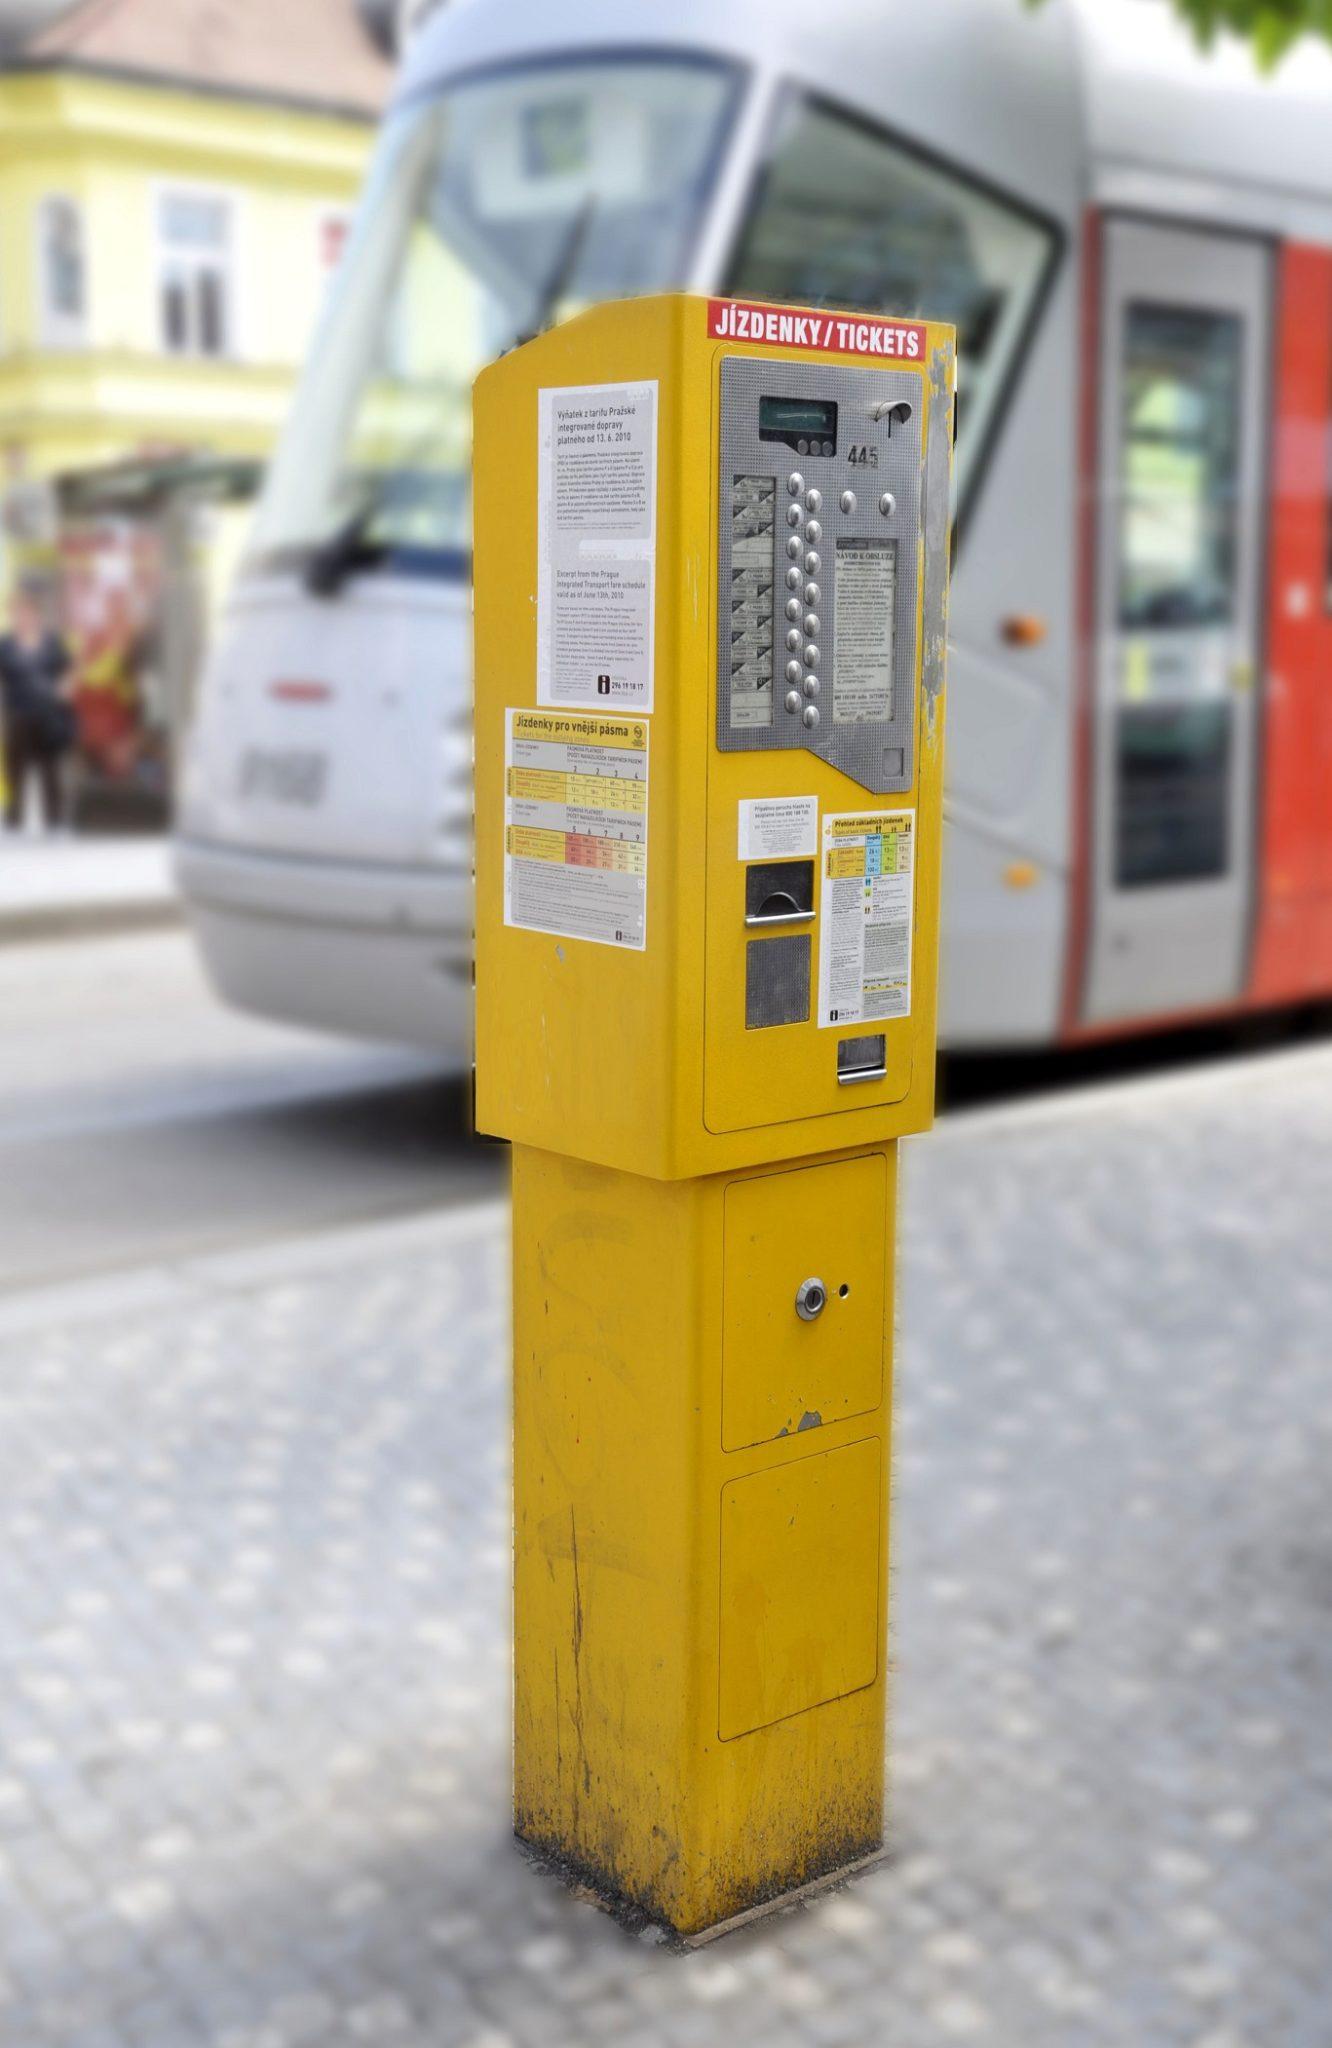 Public transport ticket machine